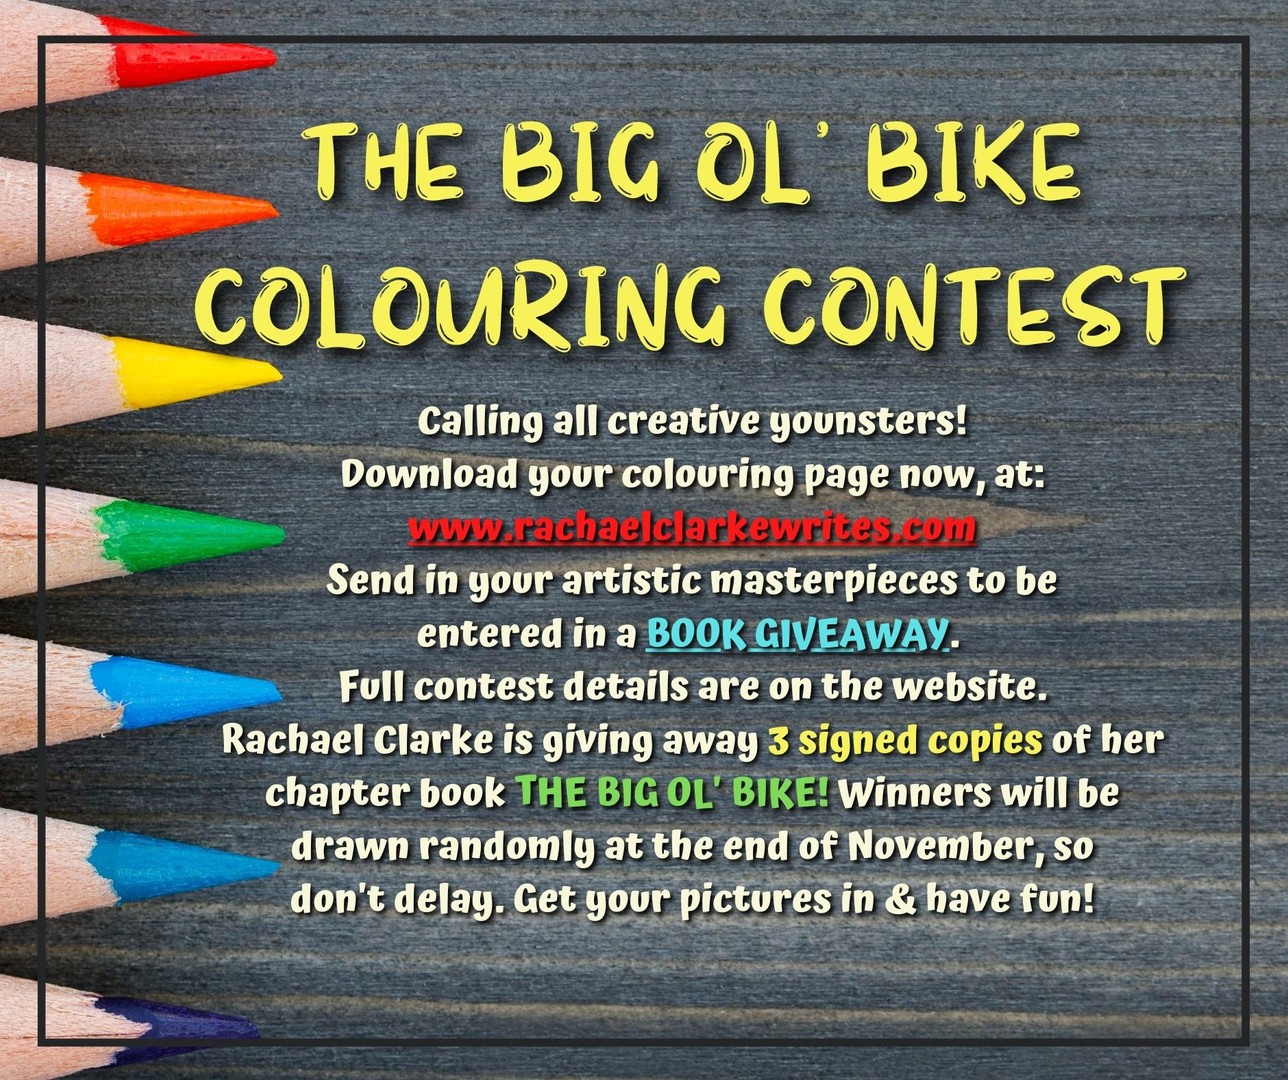 The Big Ol' Bike - Colouring Contest